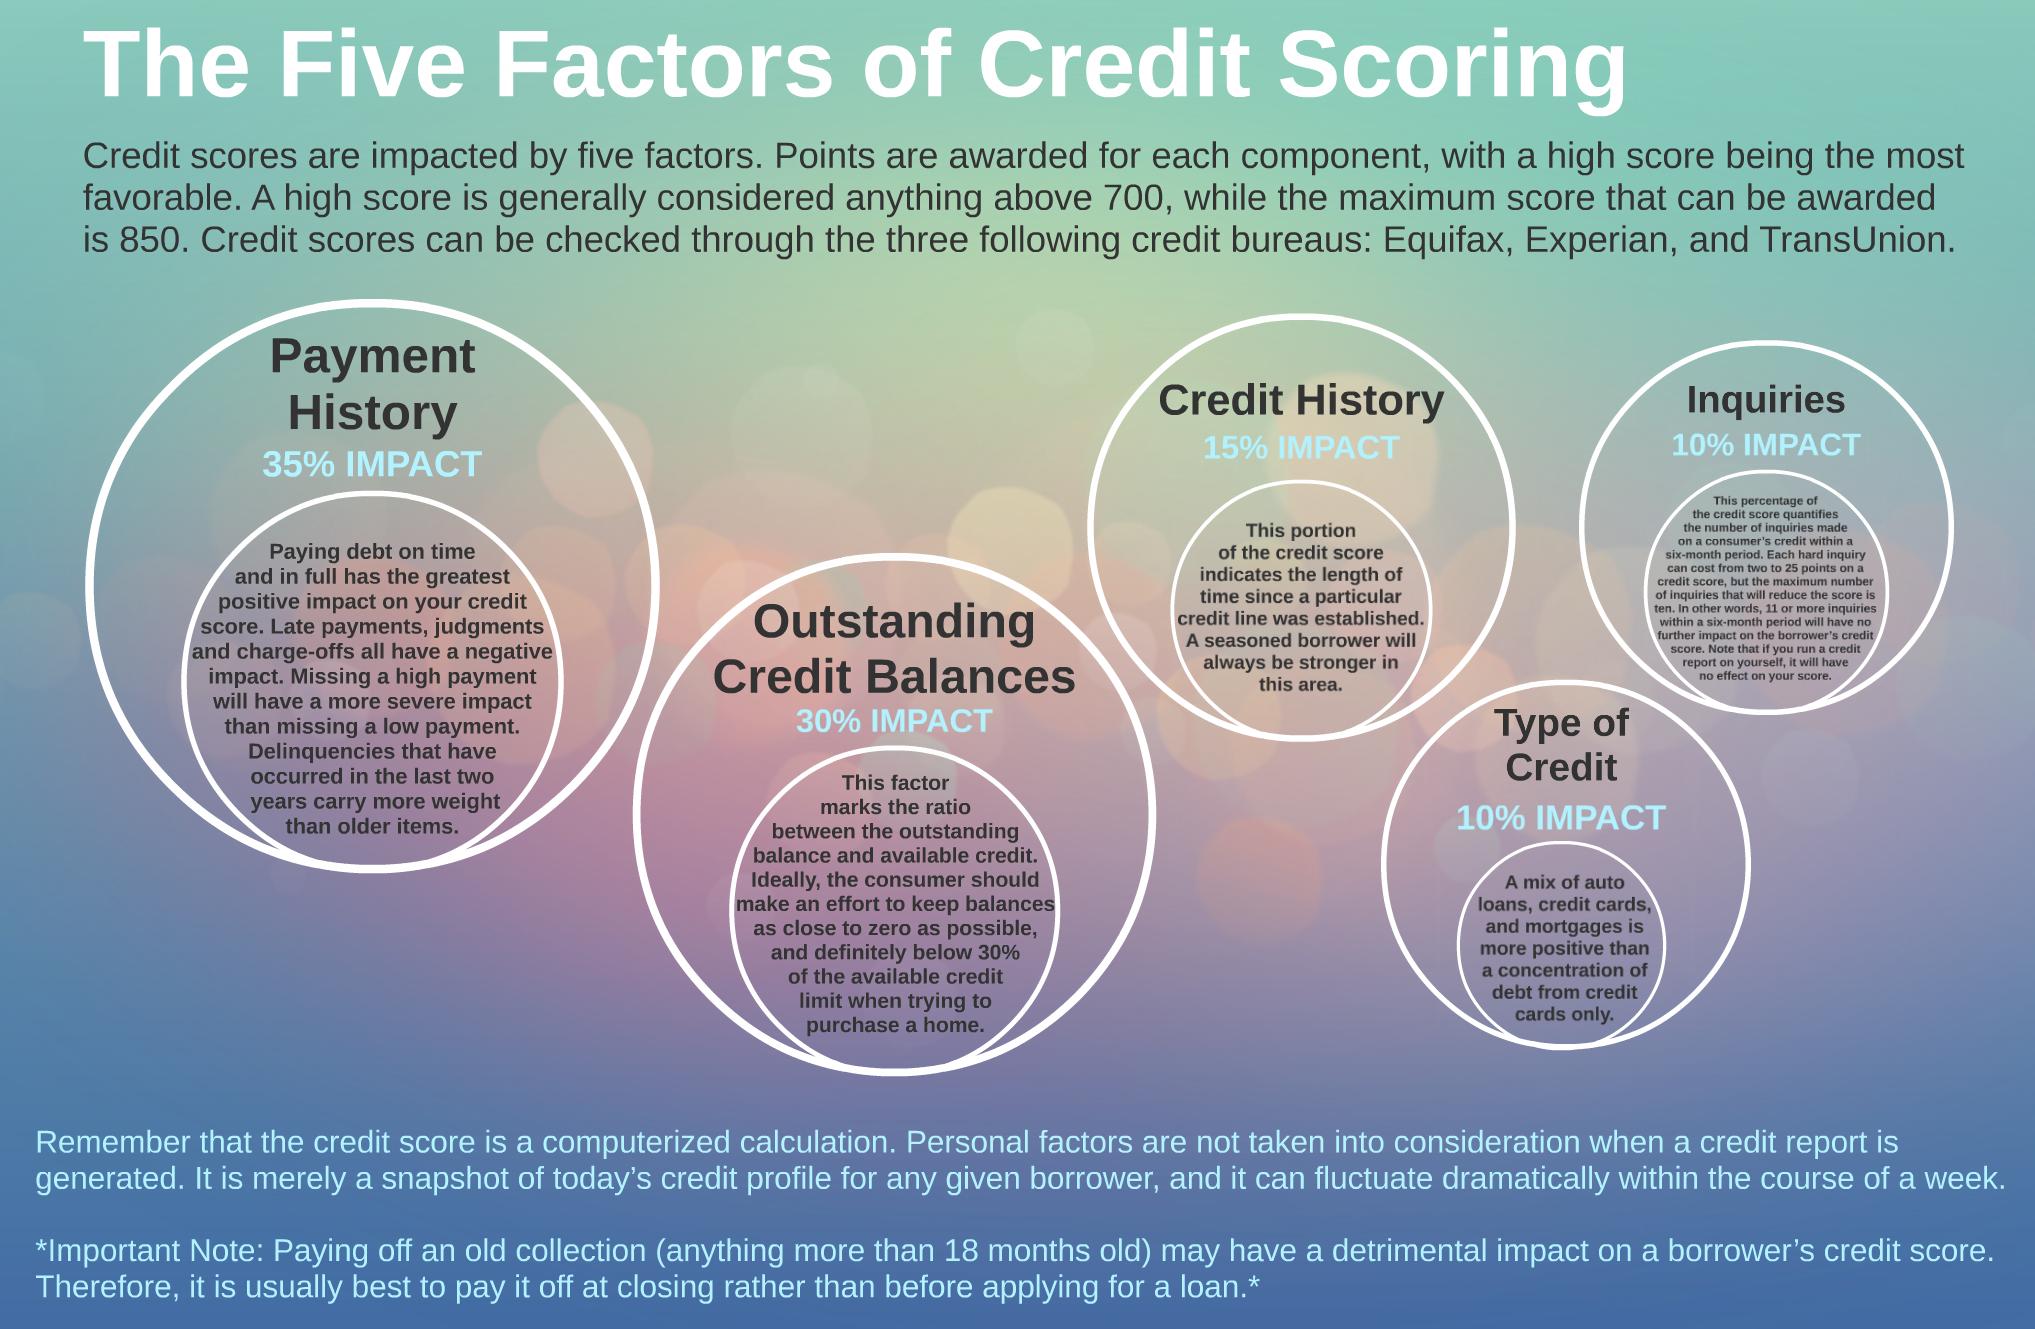 5 Factors of Credit Scoring